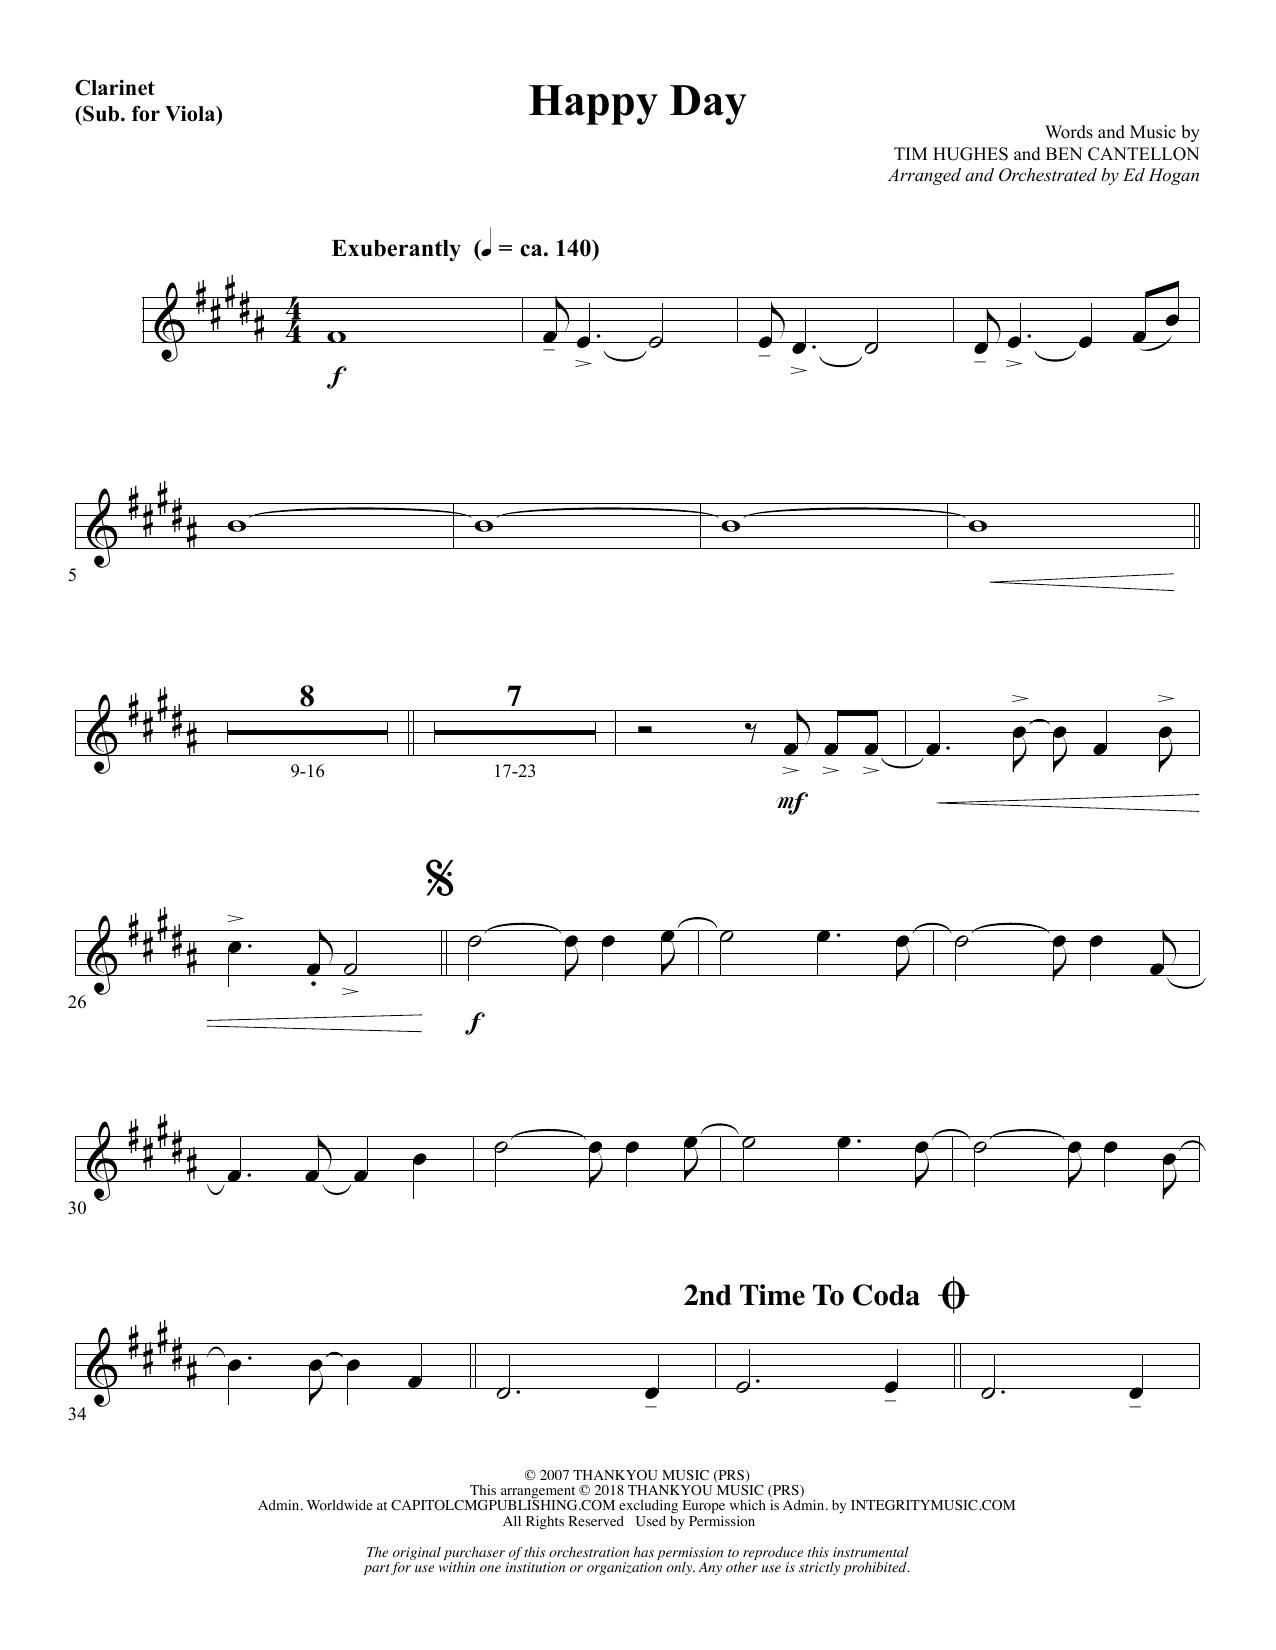 Happy Day (arr. Ed Hogan) - Clarinet (sub. Viola) (Choir Instrumental Pak)